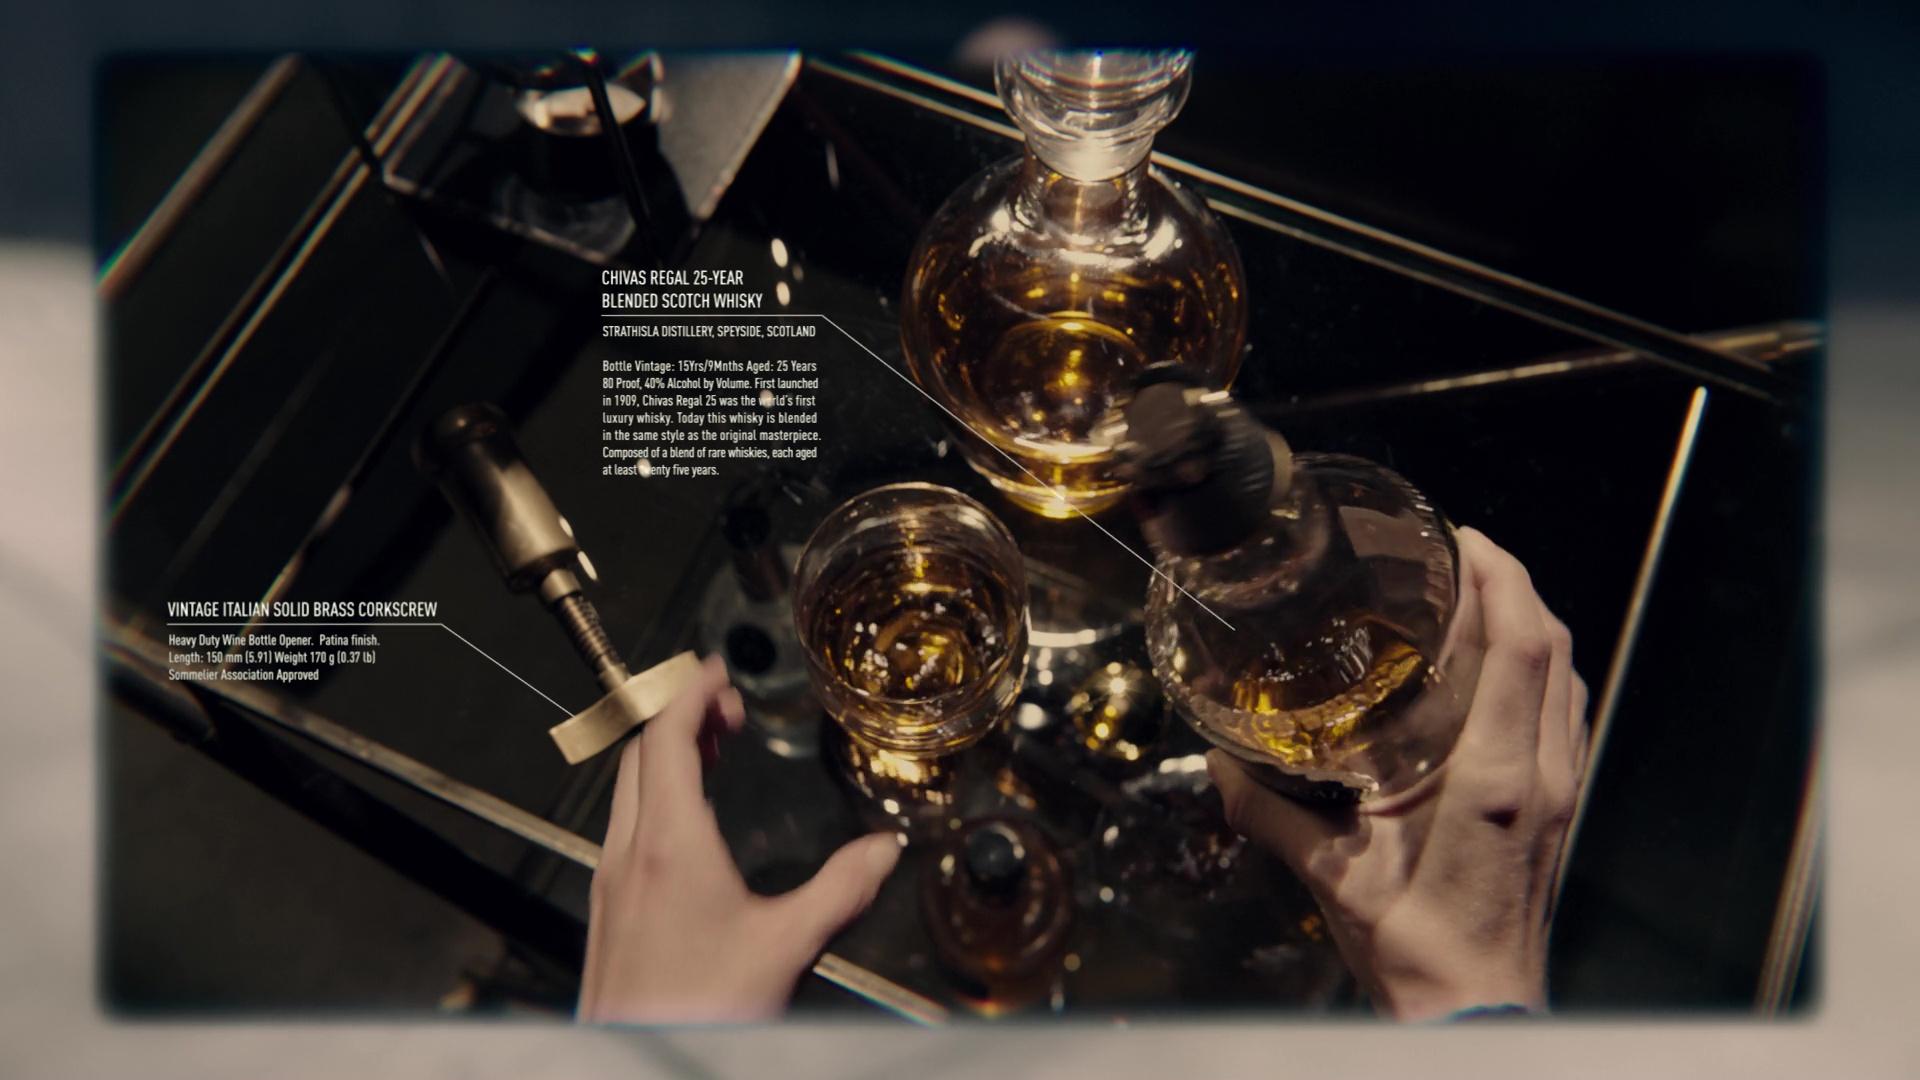 Charmed 2018 Season 1 Episode 11 putlockers jane the Virgin